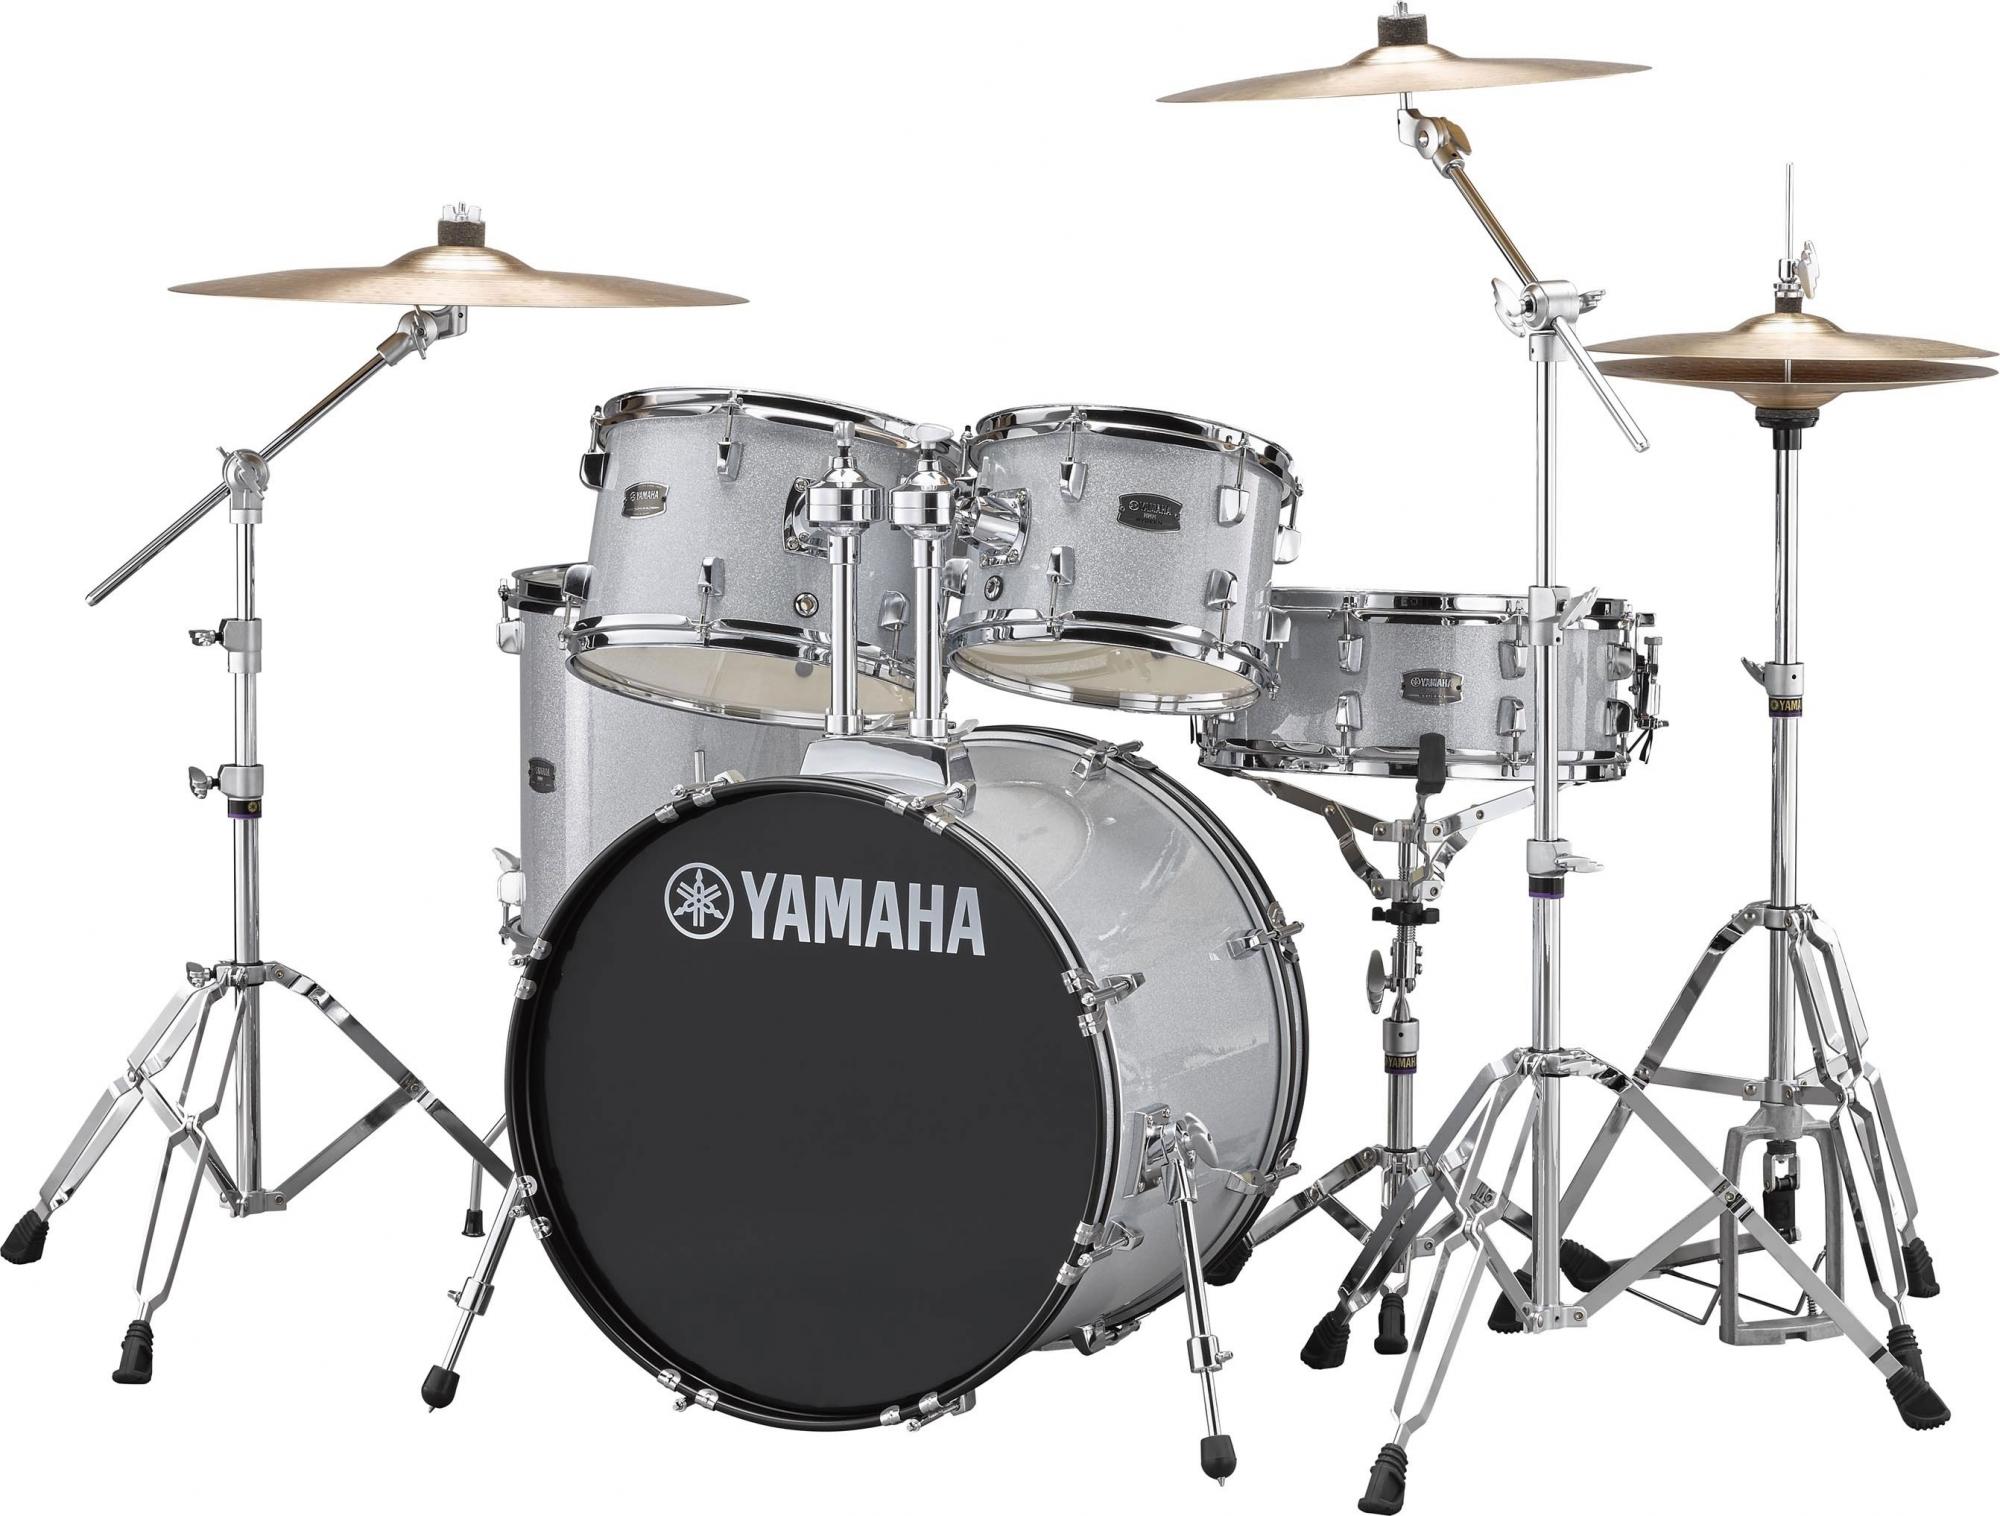 Yamaha Rydeen Studio Trommesæt - inkl. hardwarepakke og bækkener - Silver Glitter